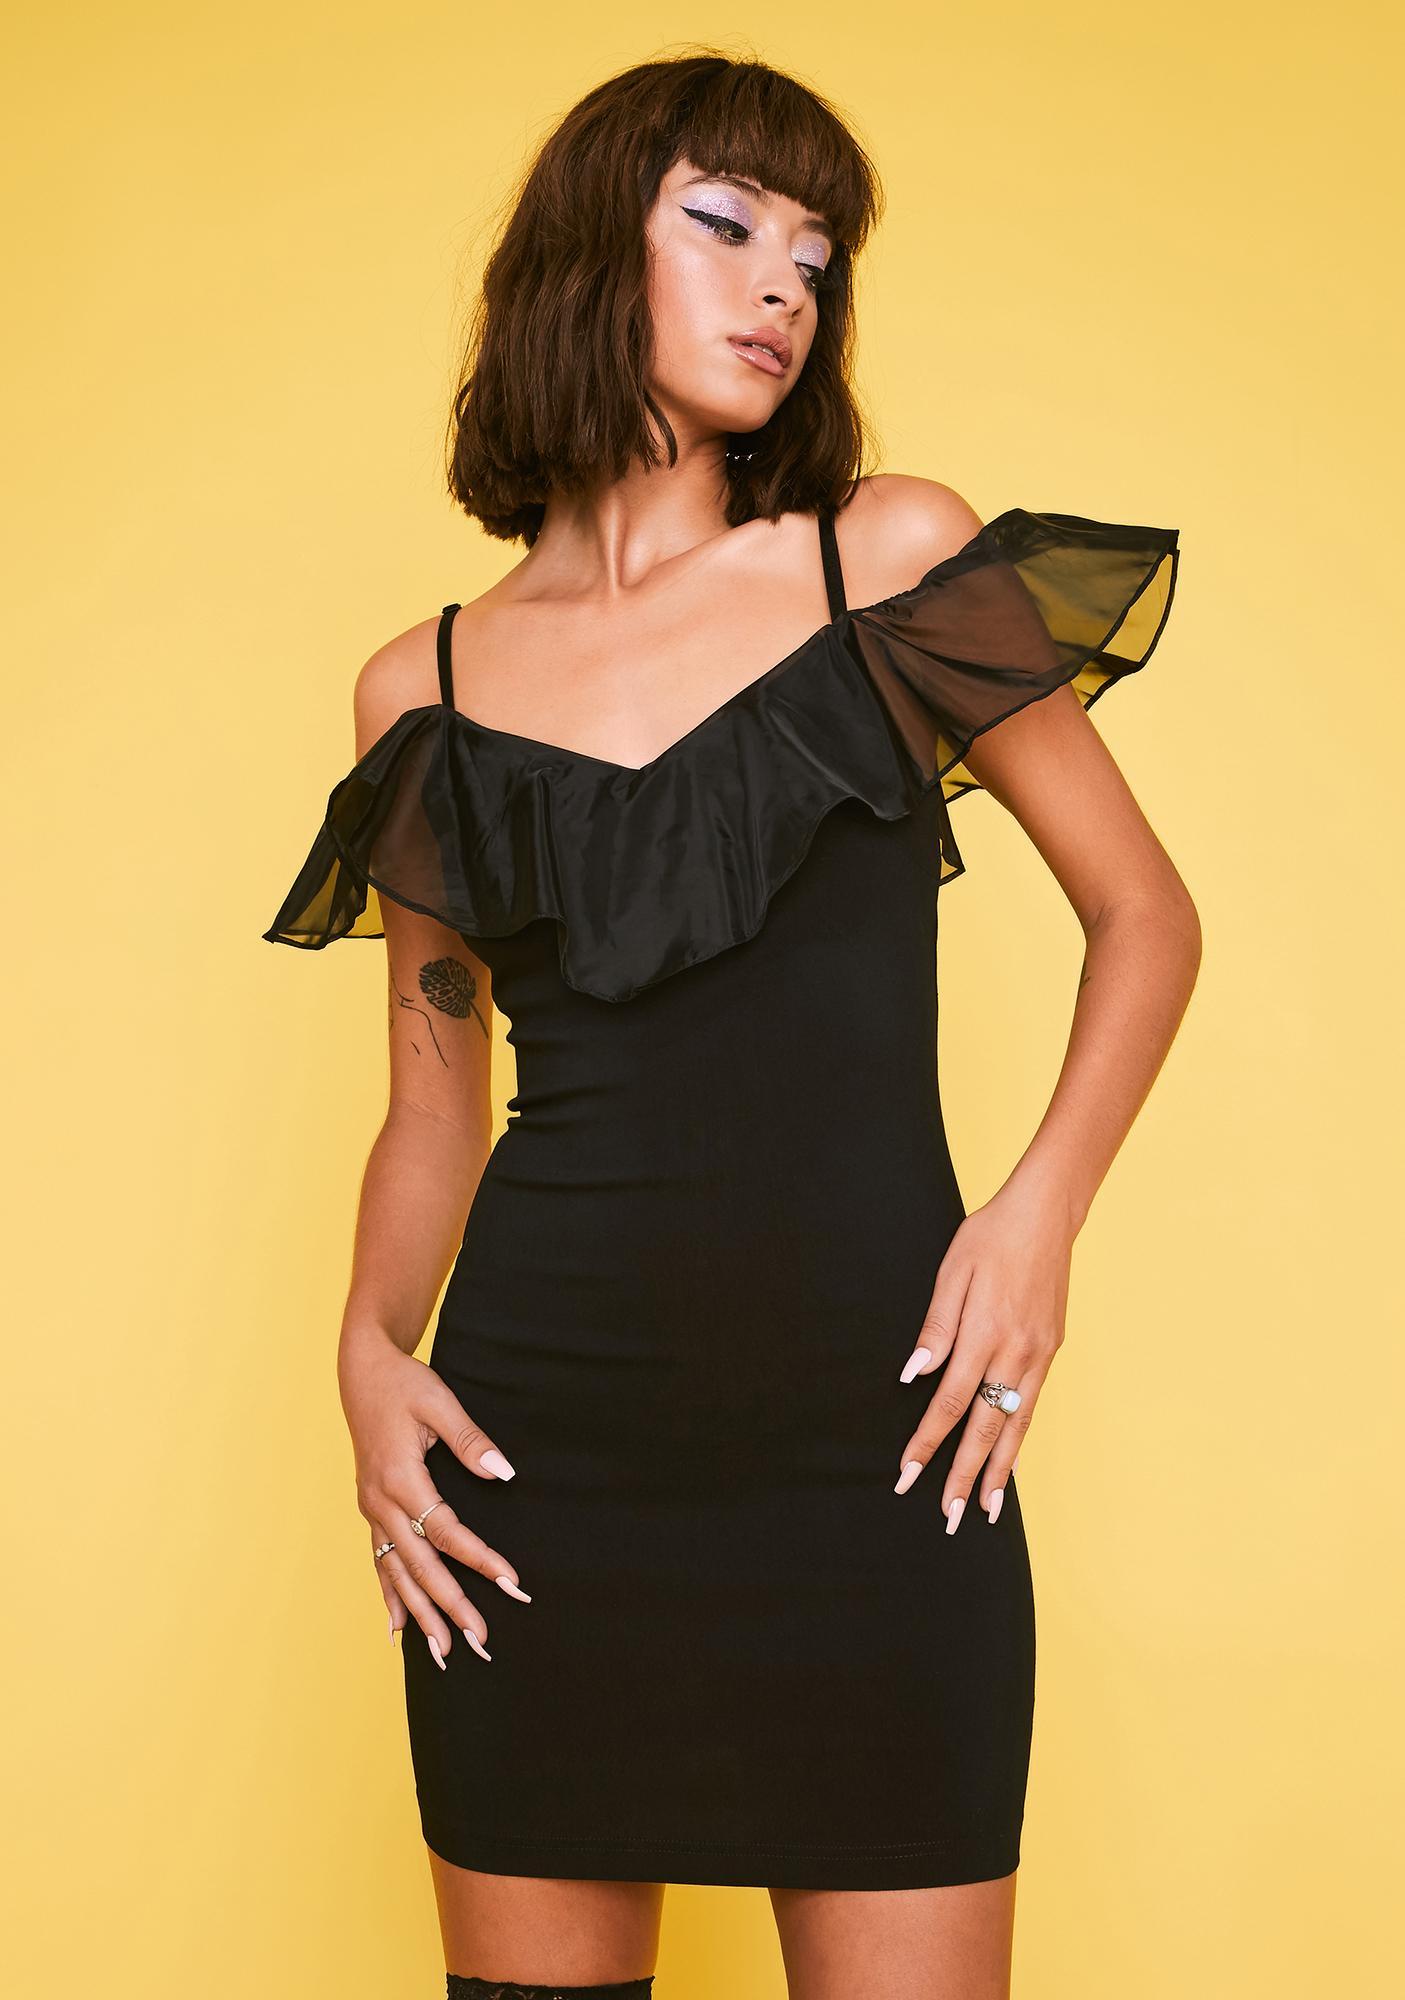 HOROSCOPEZ Party Of One Mini Dress